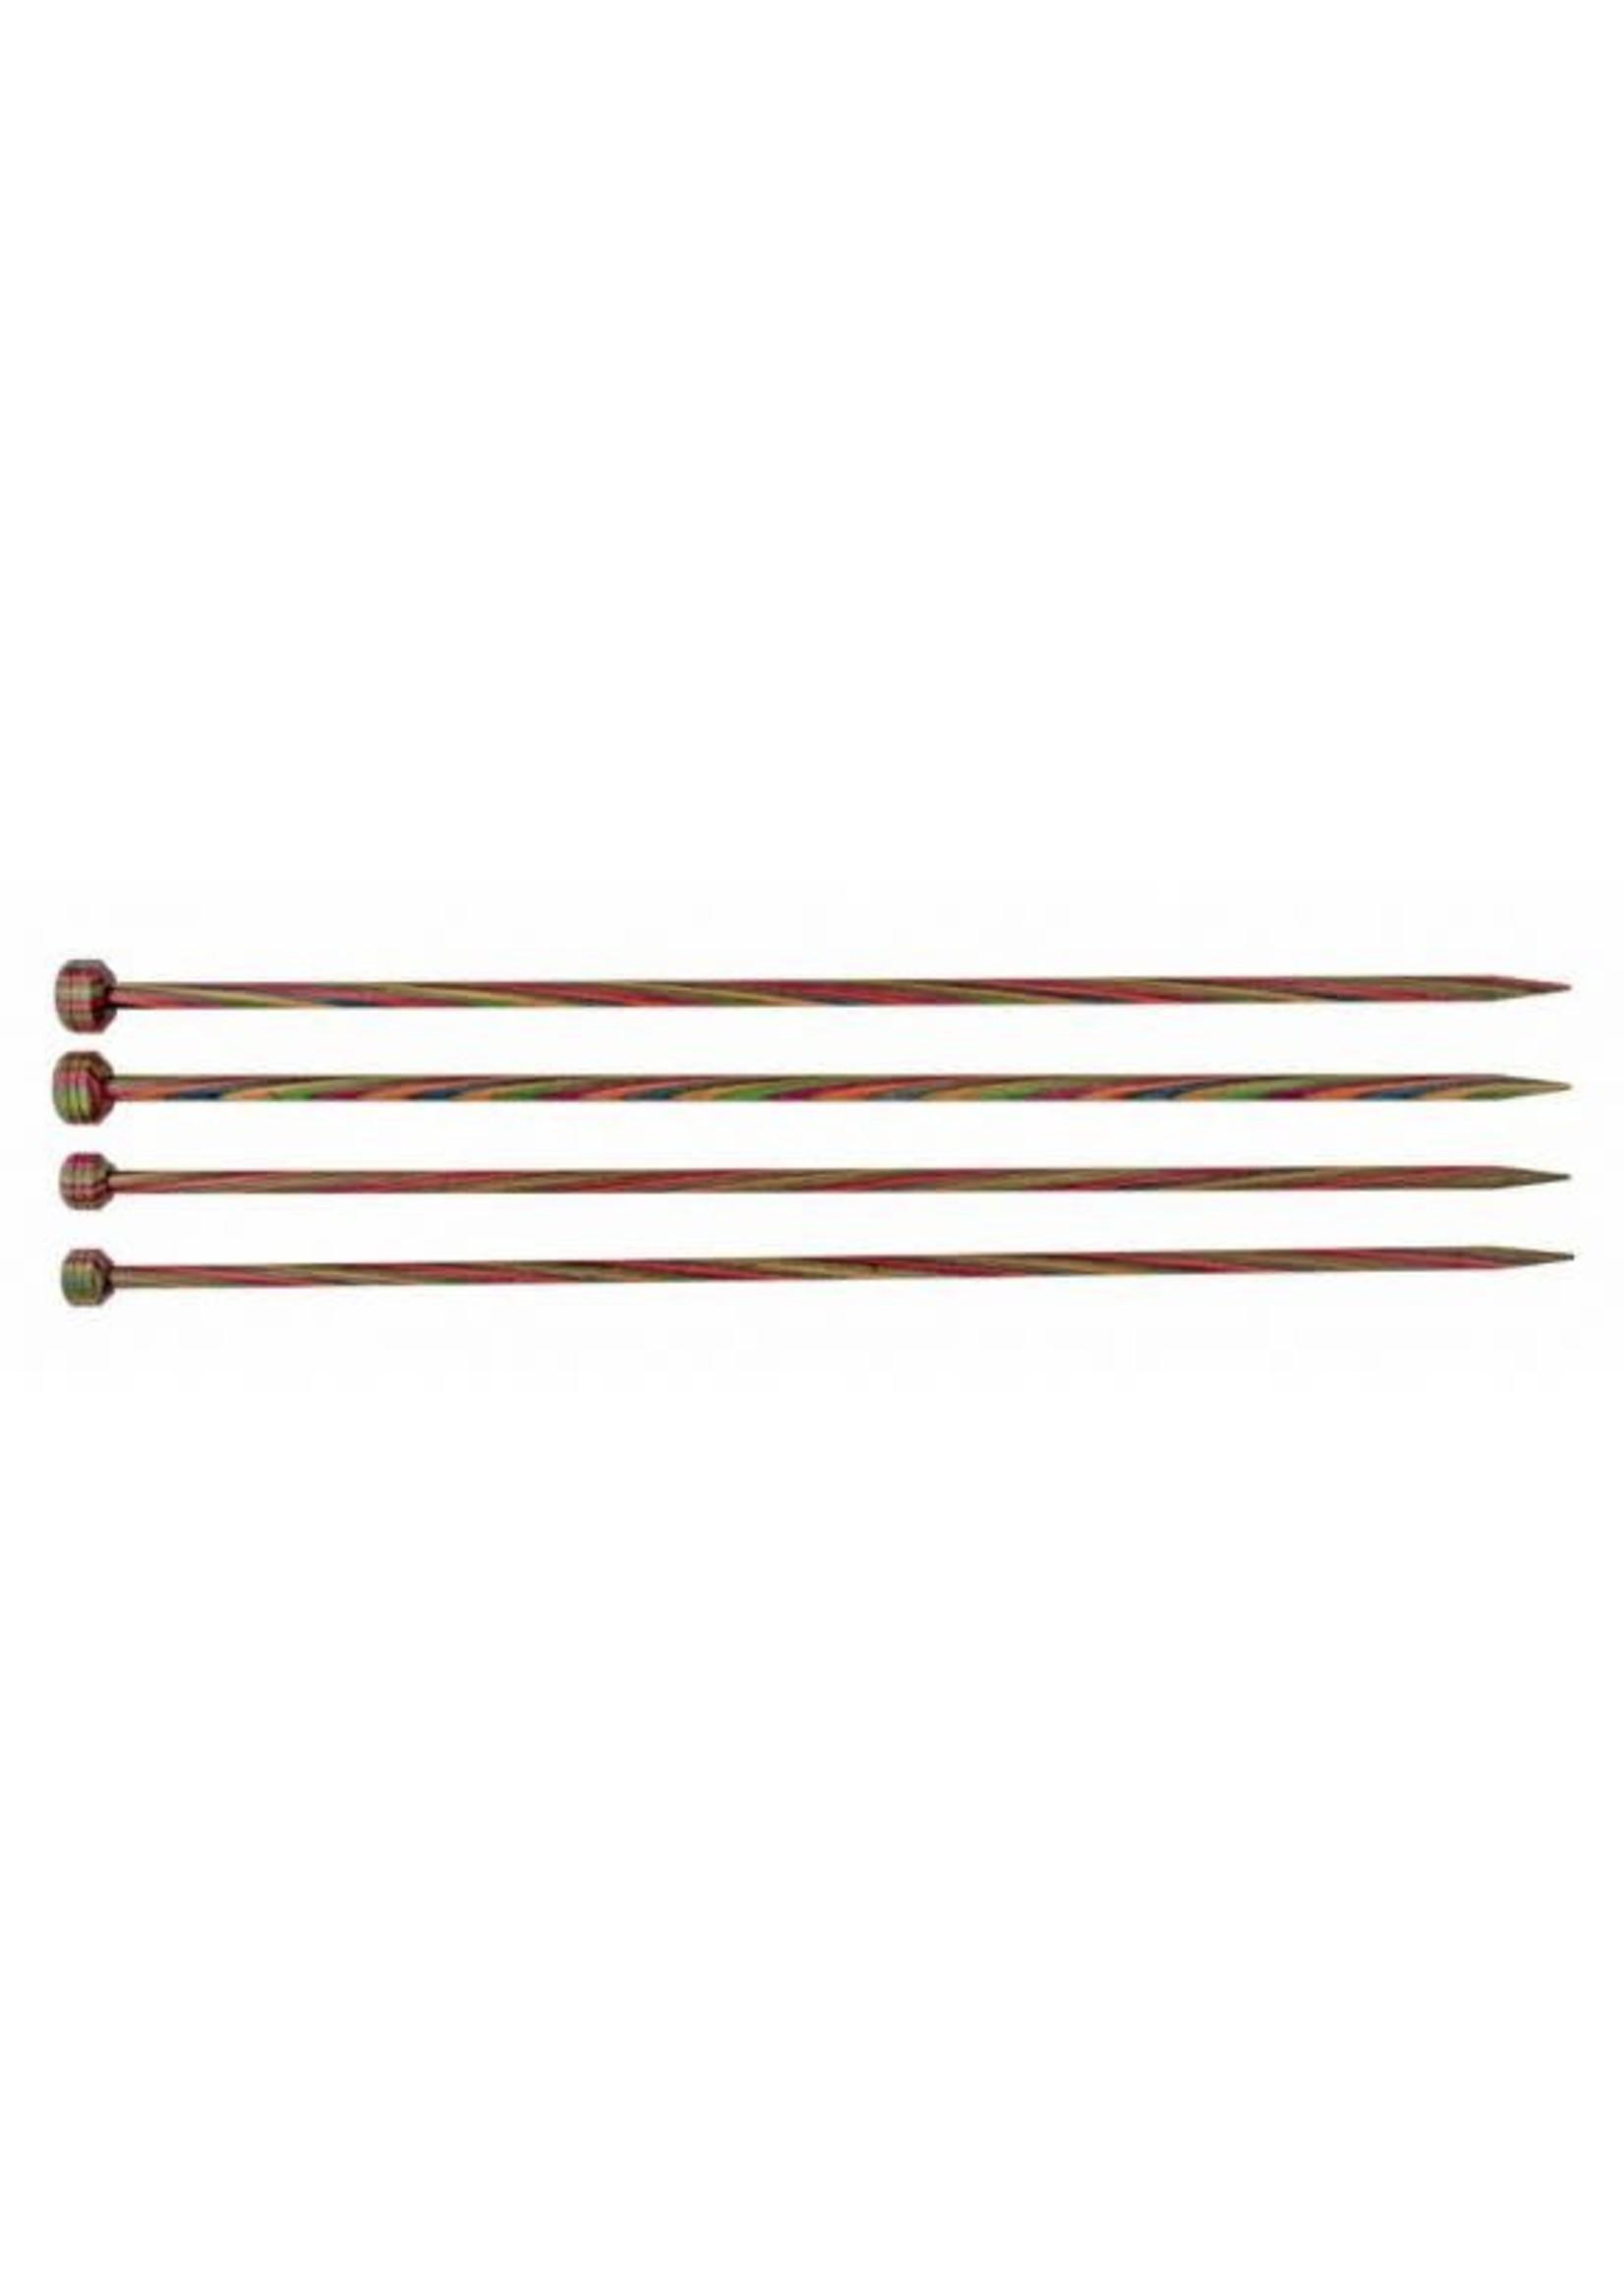 KnitPro Knitpro Symfonie Breinaalden 35cm met knop - 4.00mm